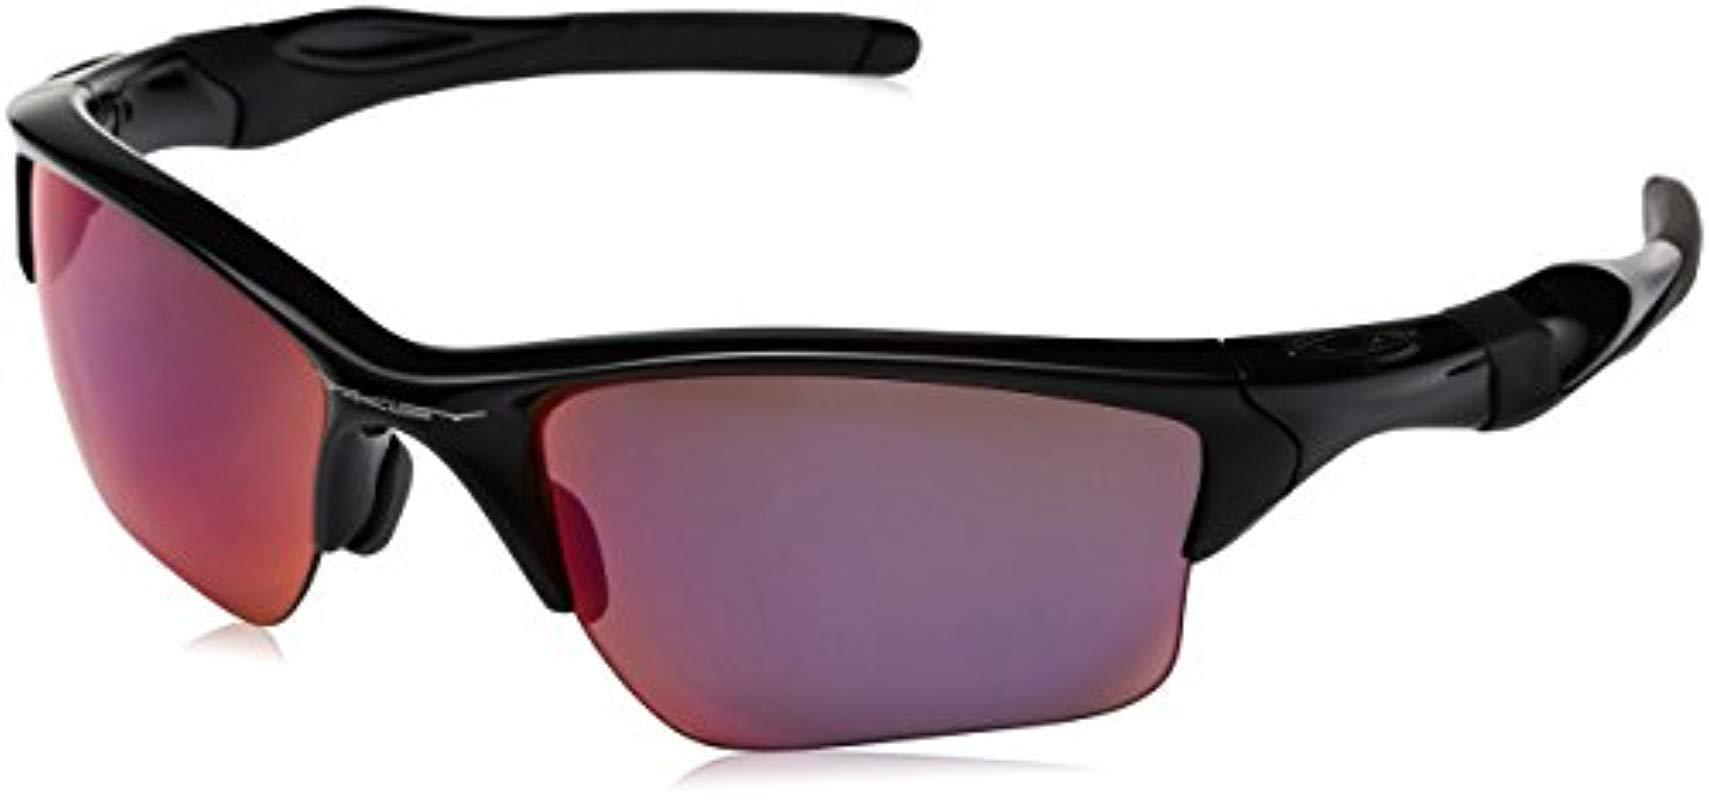 6a8f3dc5239 Lyst - Oakley Half Jacket 2.0 Xl Polarized Sunglasses in Black for Men